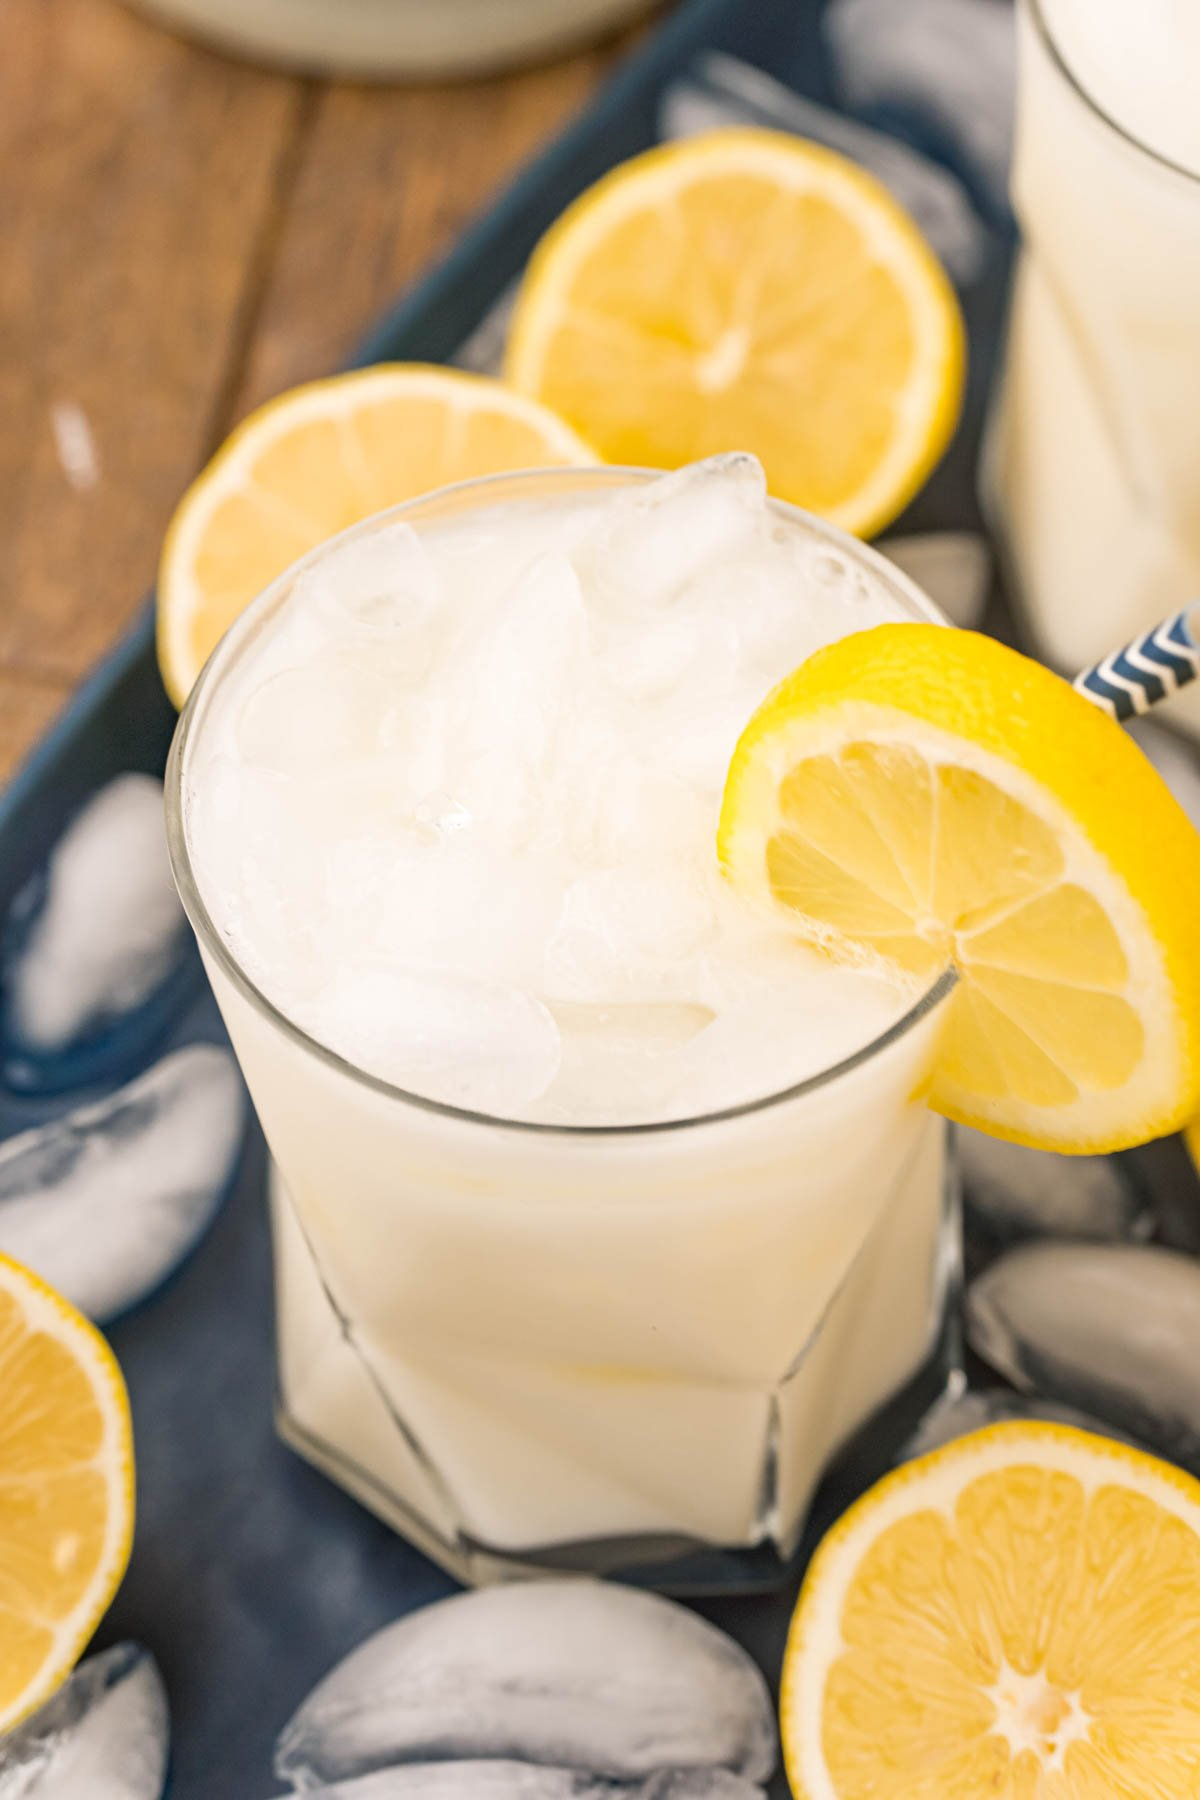 glass of creamy lemonade with a lemon slice